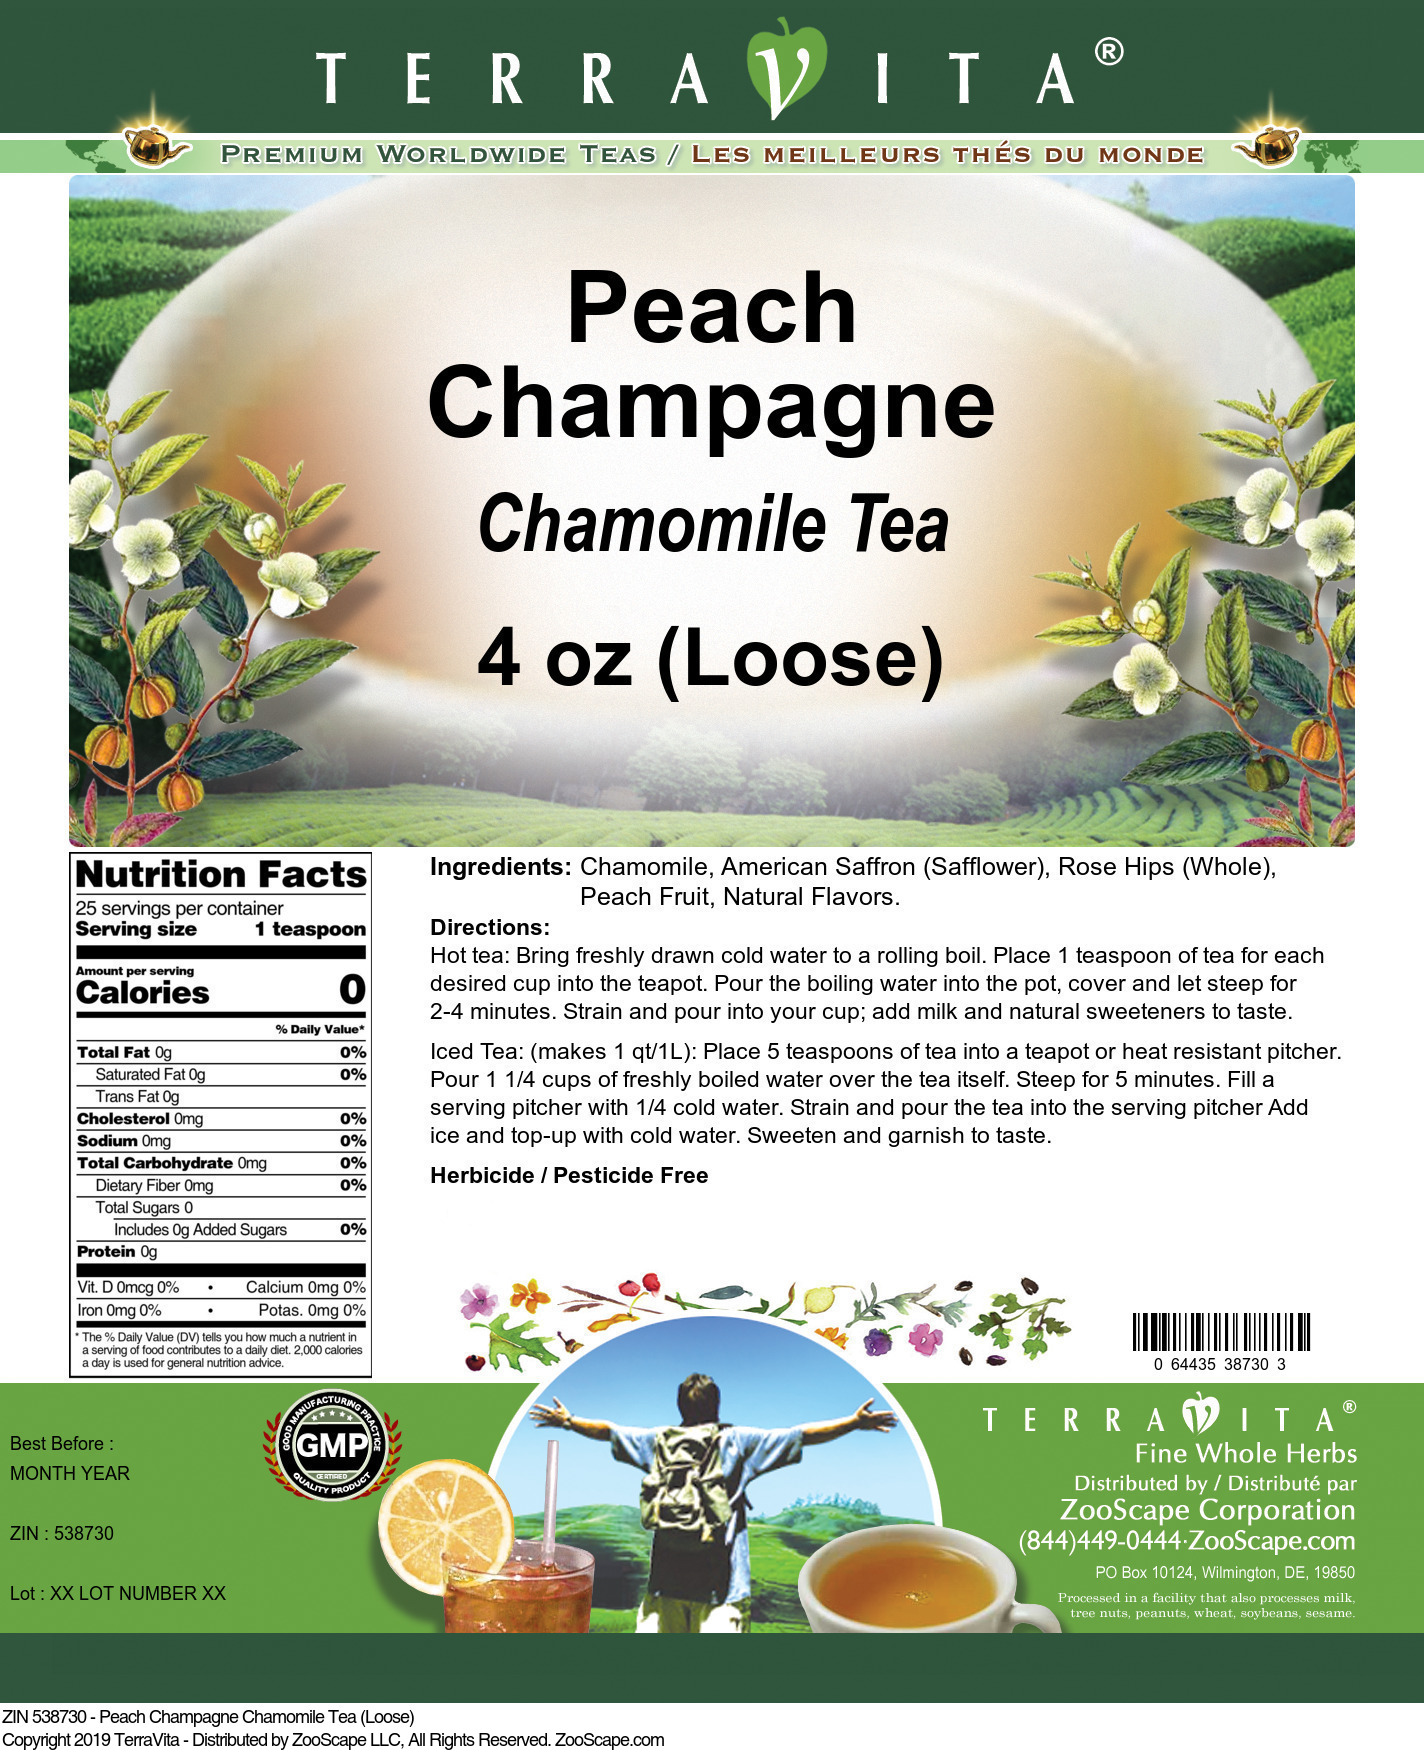 Peach Champagne Chamomile Tea